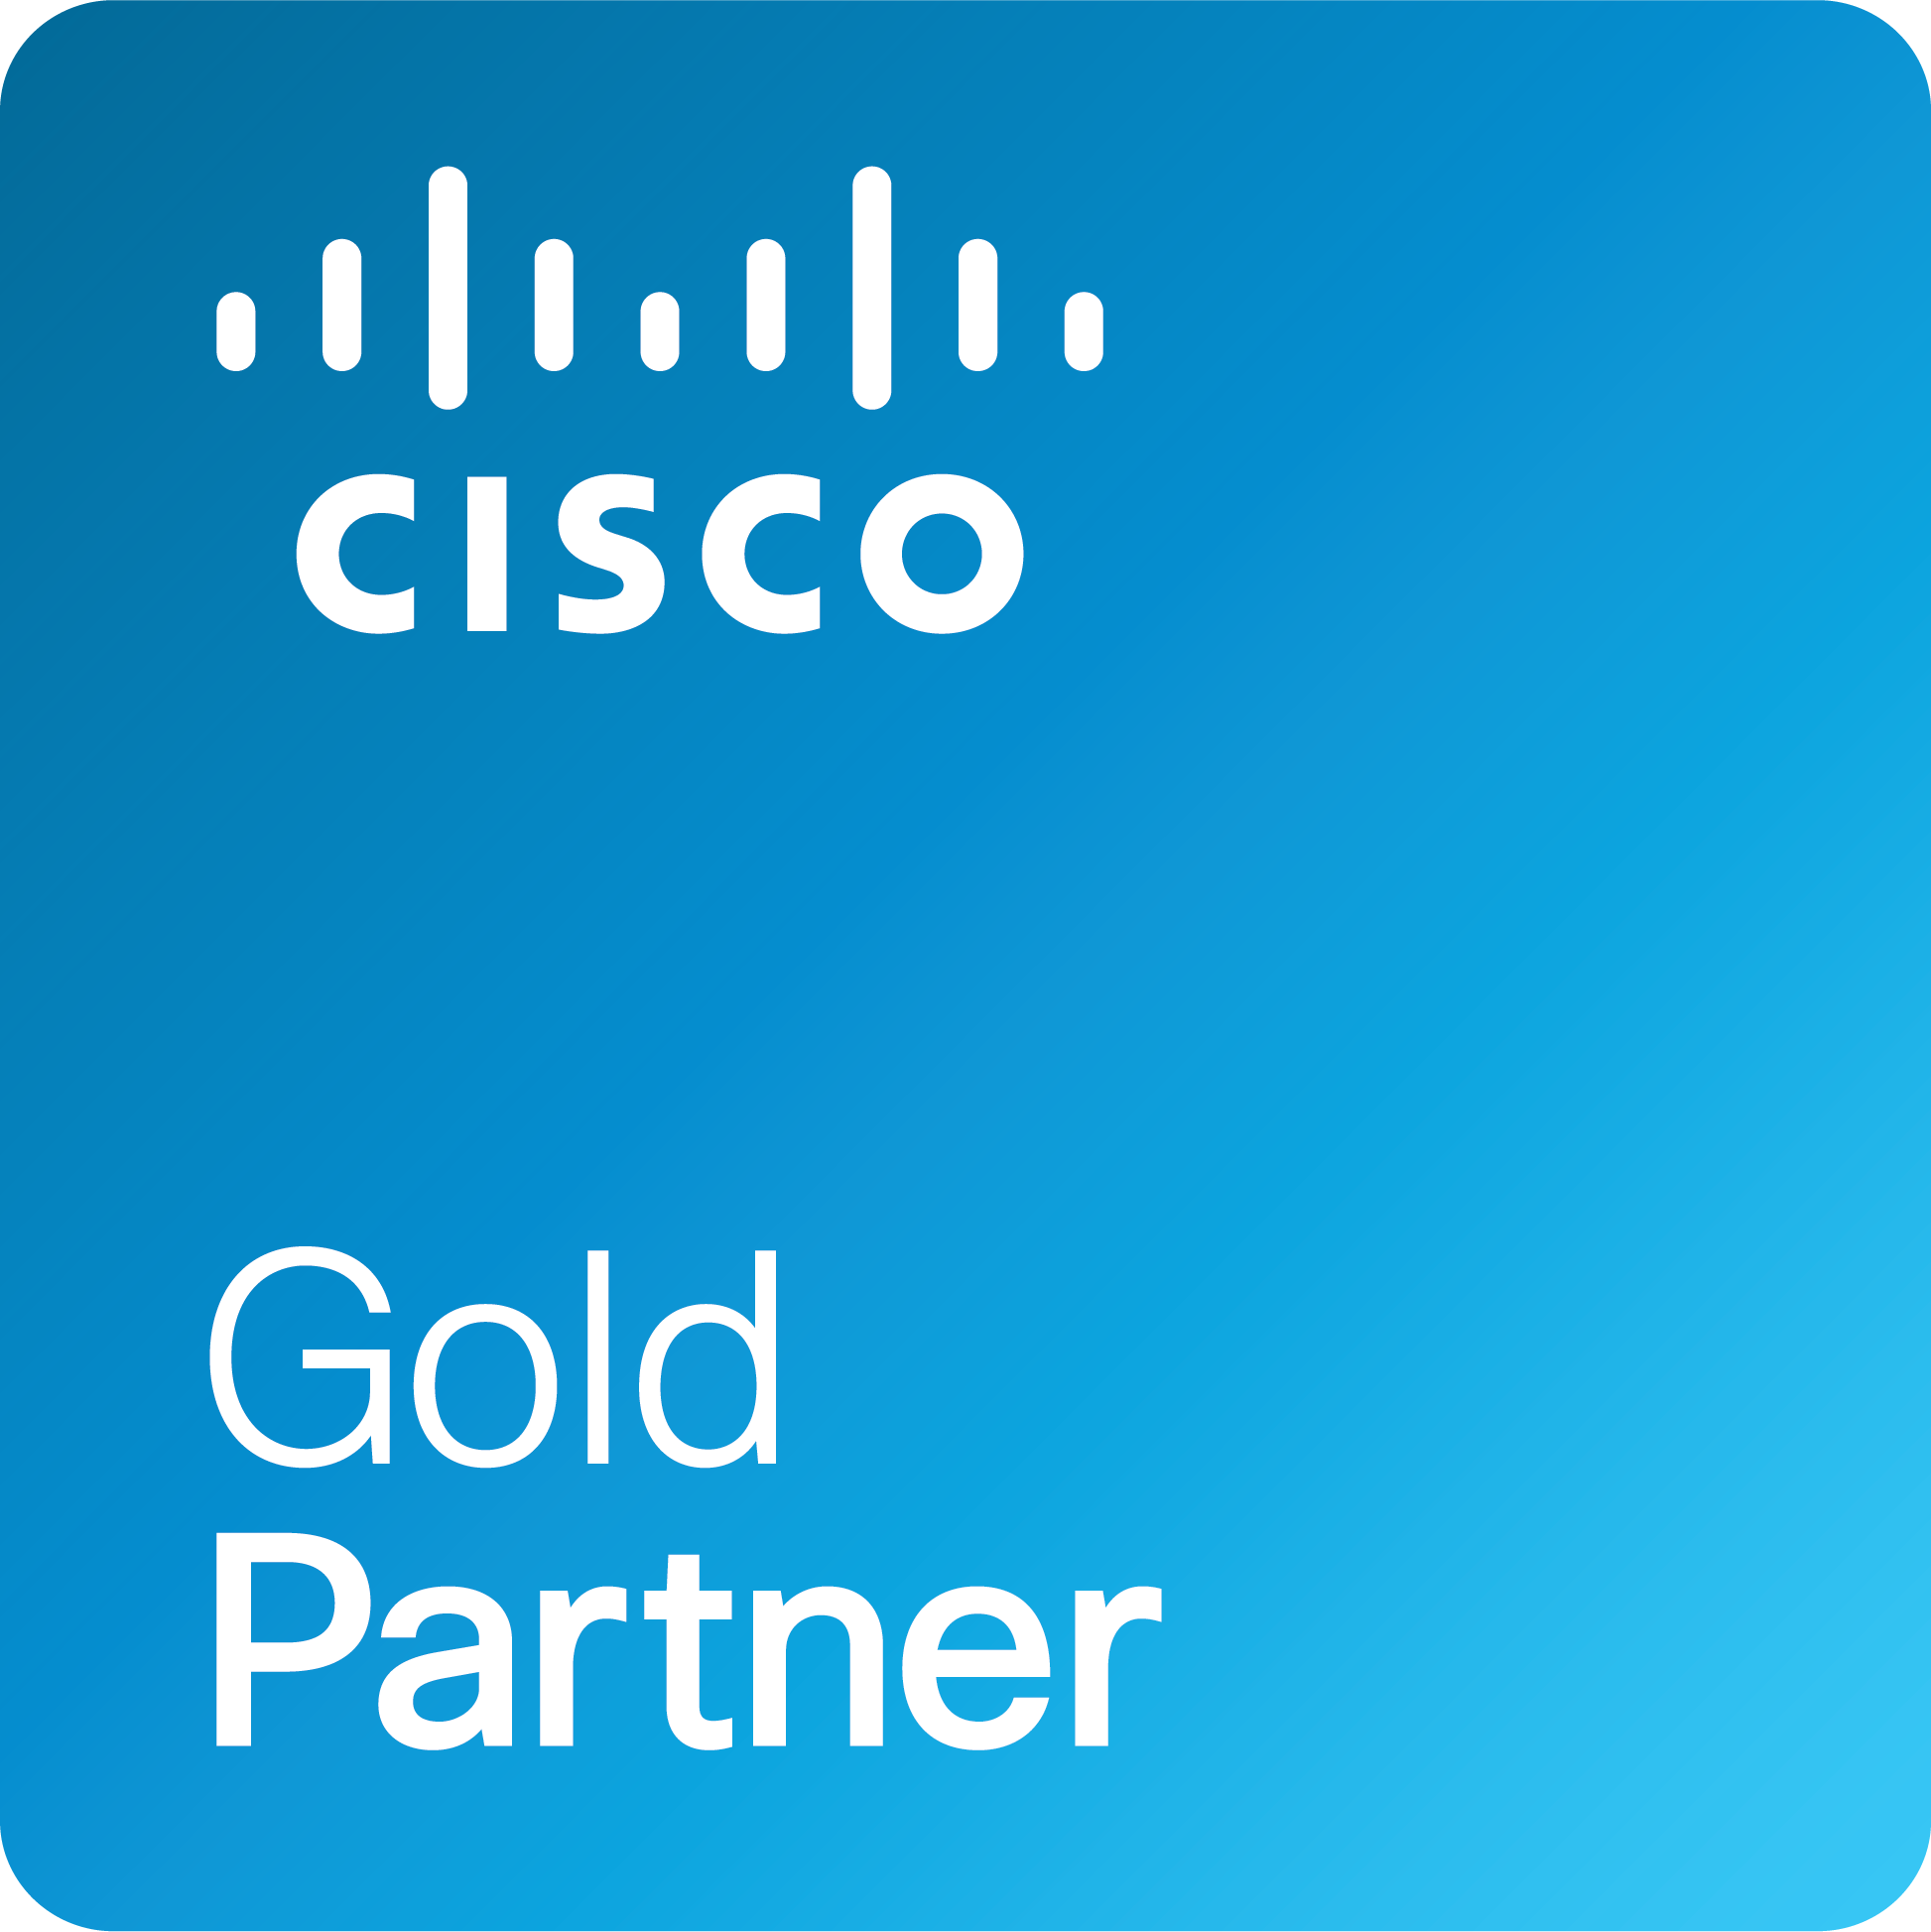 Cisco_Partner_Channel_Gold.png